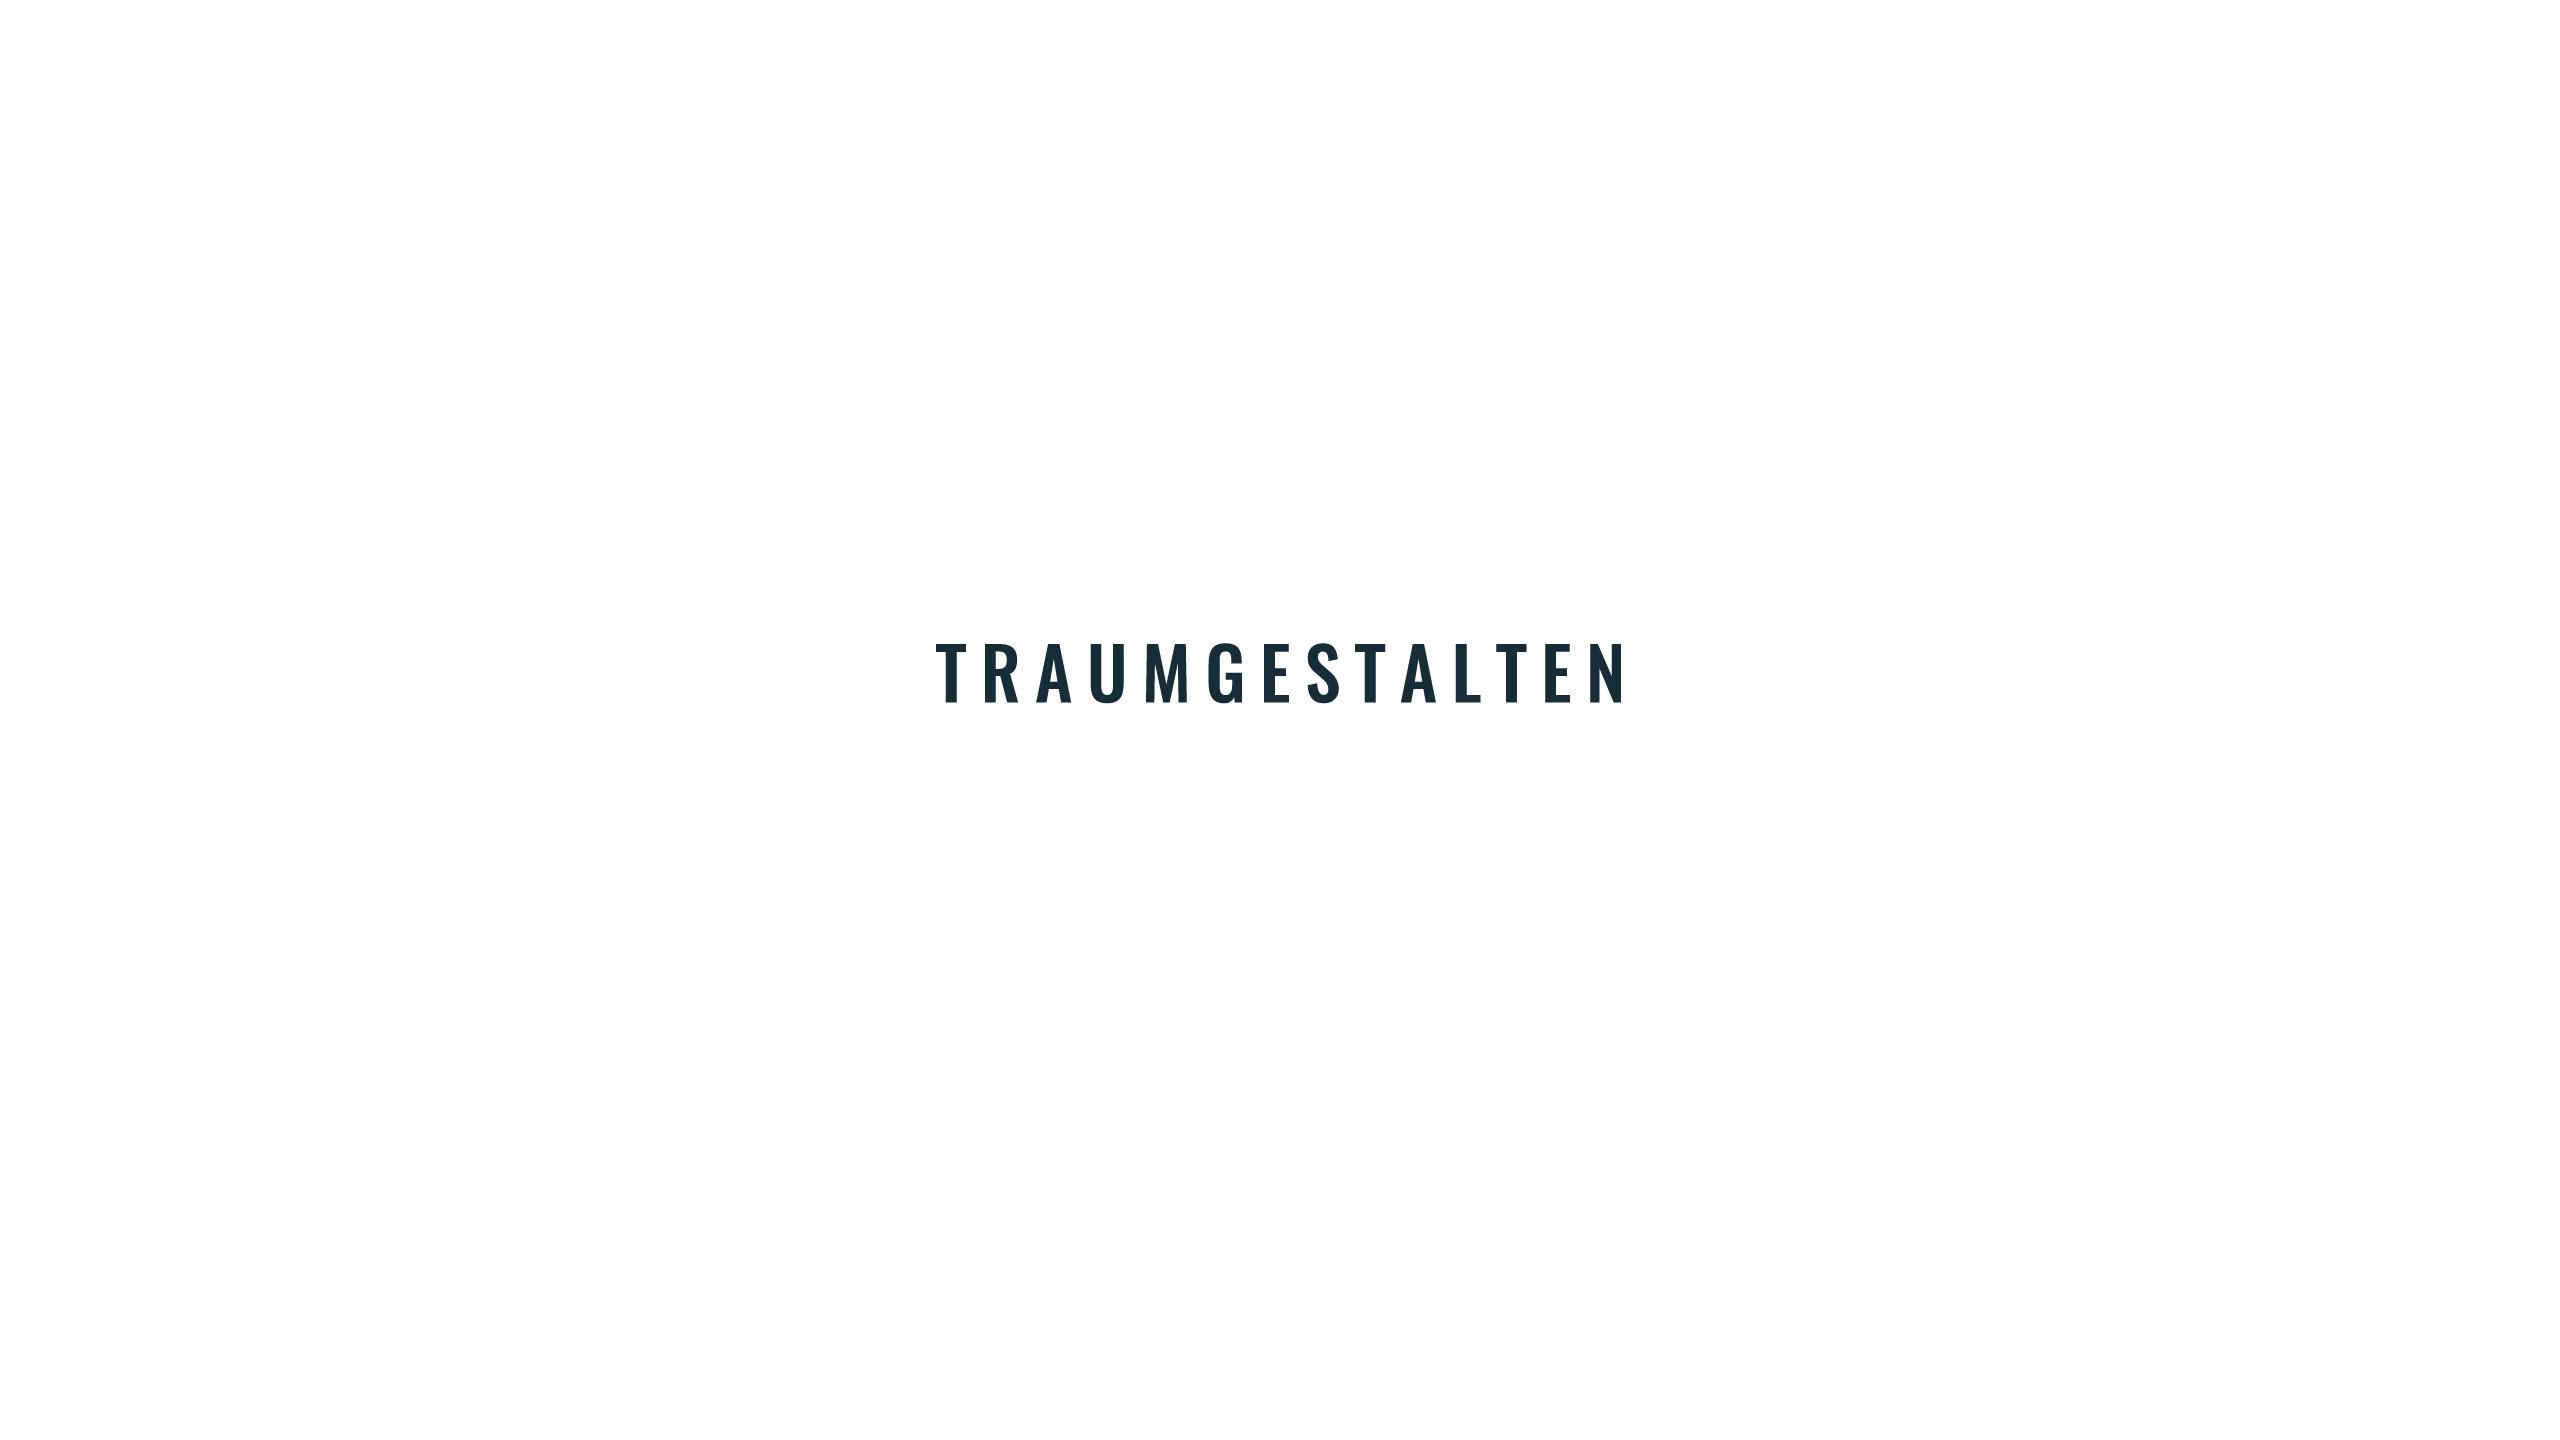 1a_Text_TRAUMGESTALTEN